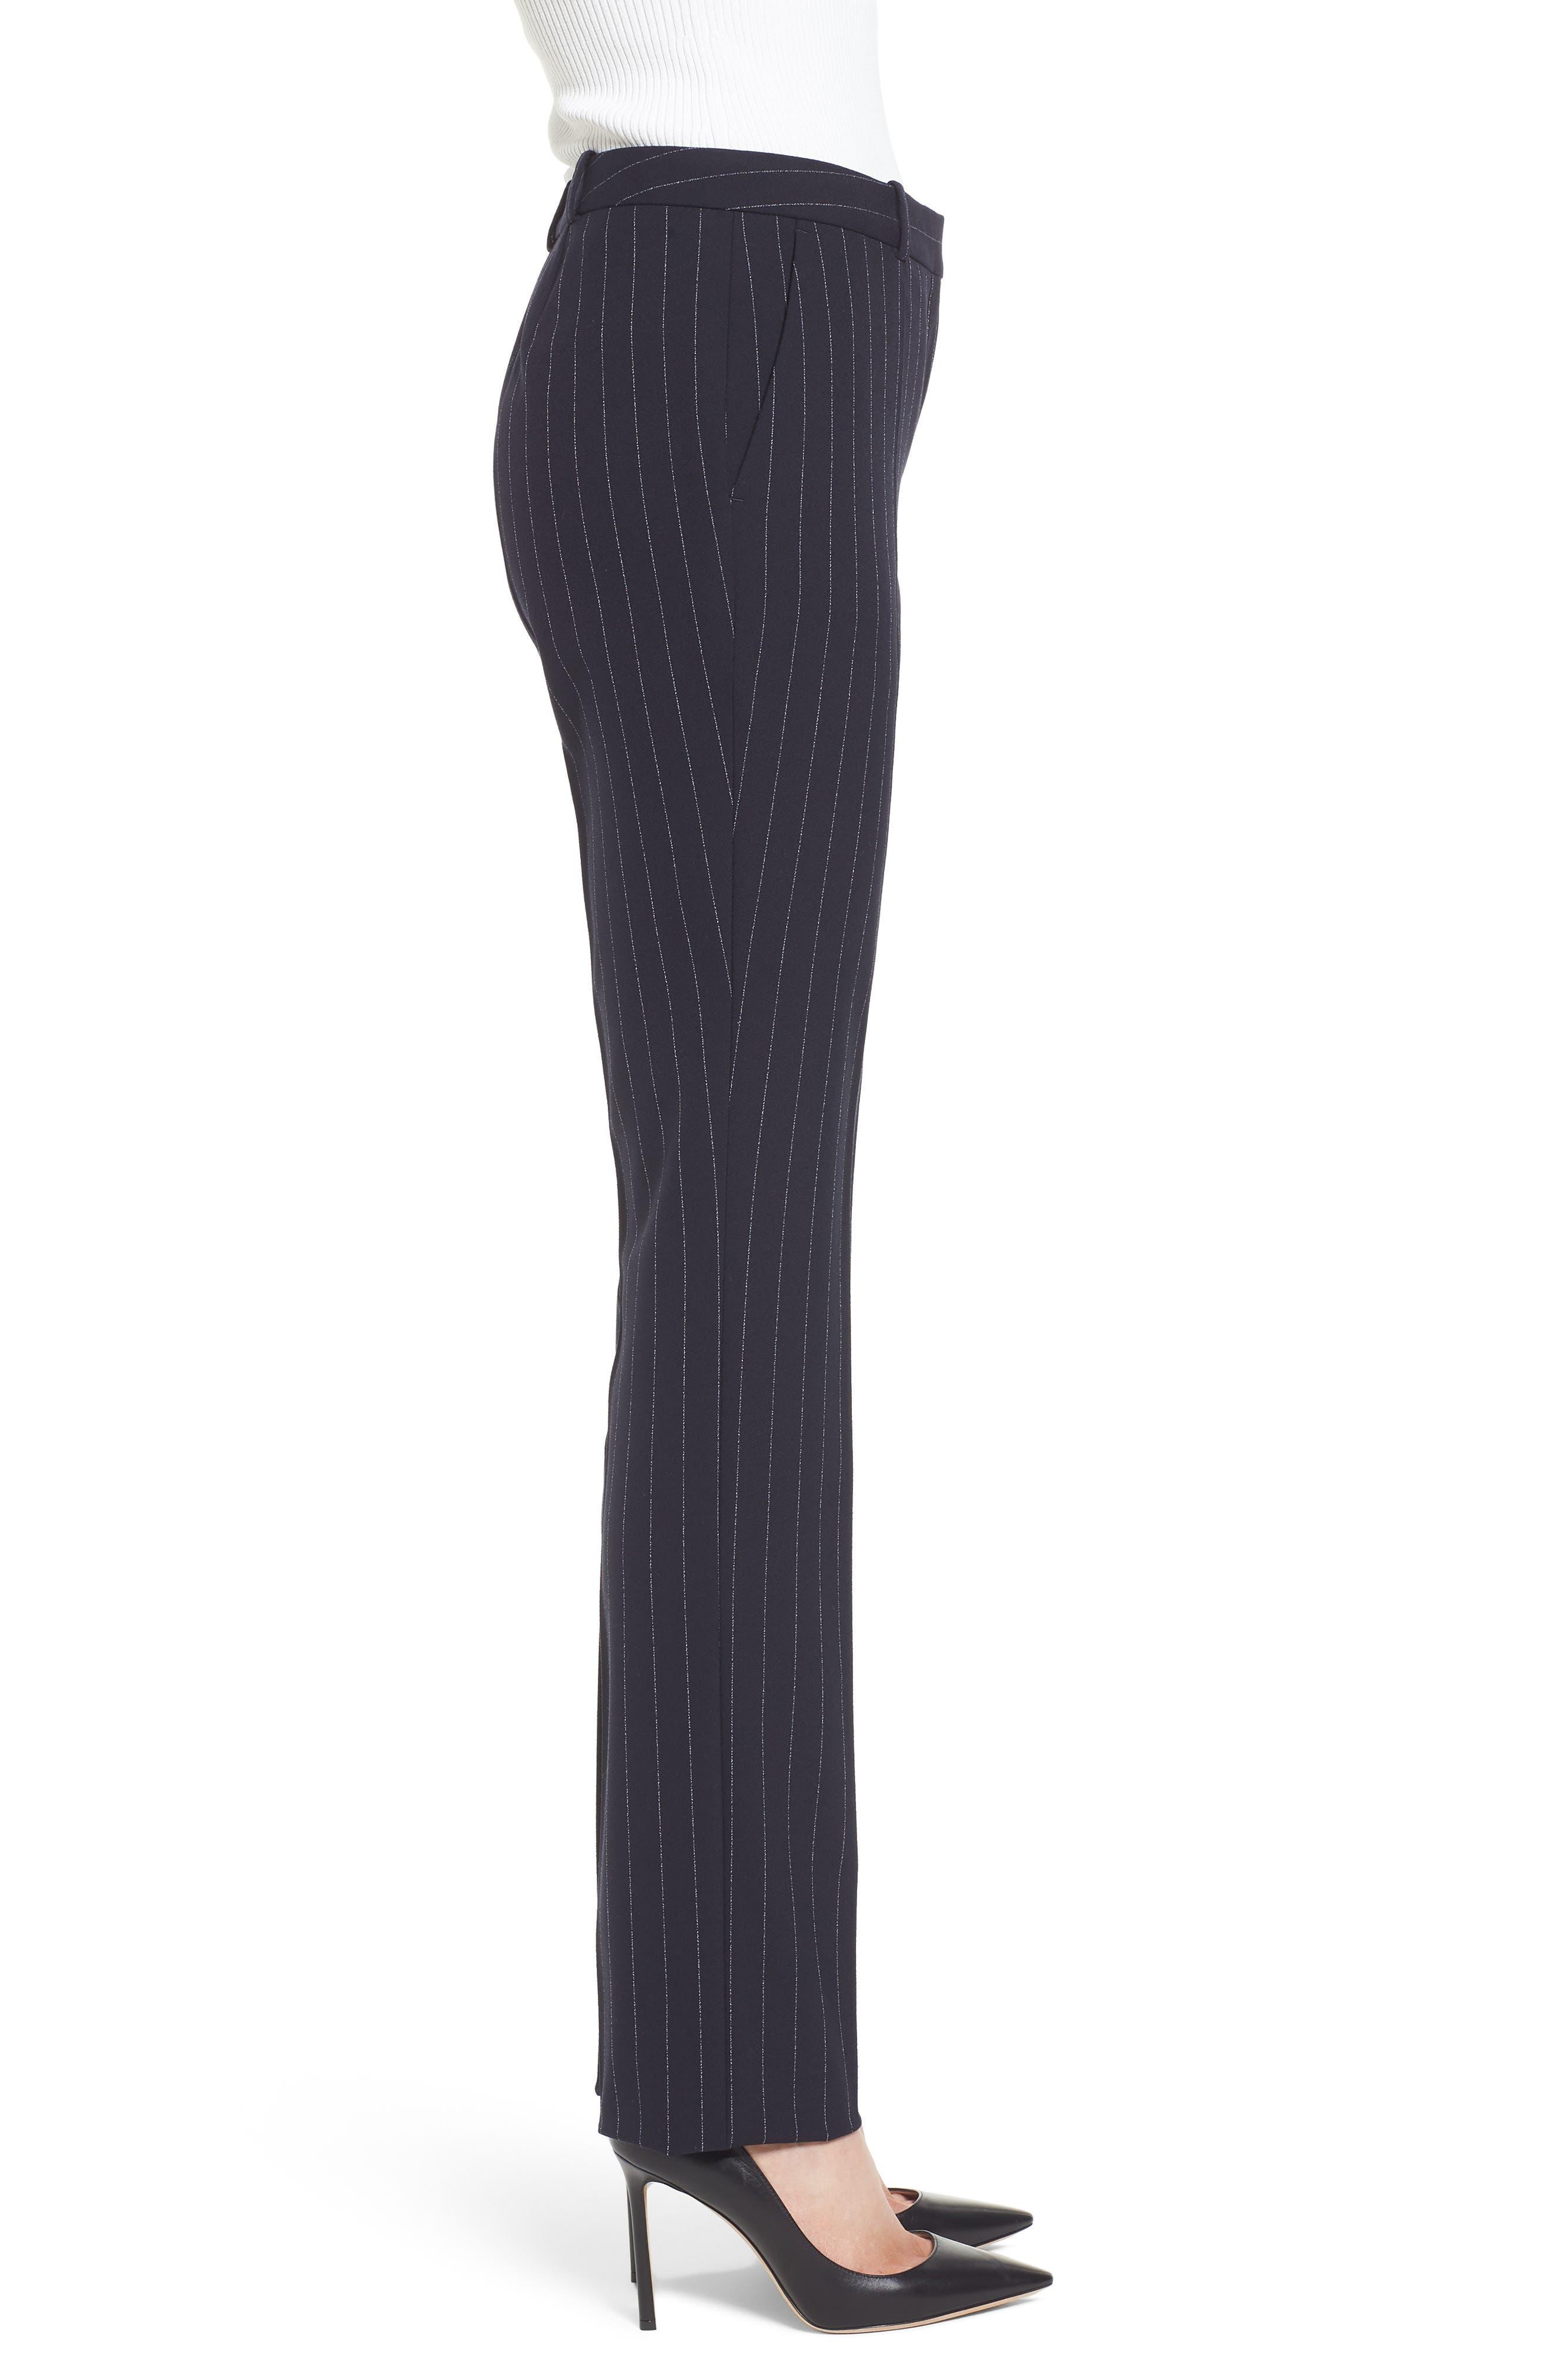 Titana Pinstripe Suit Trousers,                             Alternate thumbnail 4, color,                             Navy Fantasy